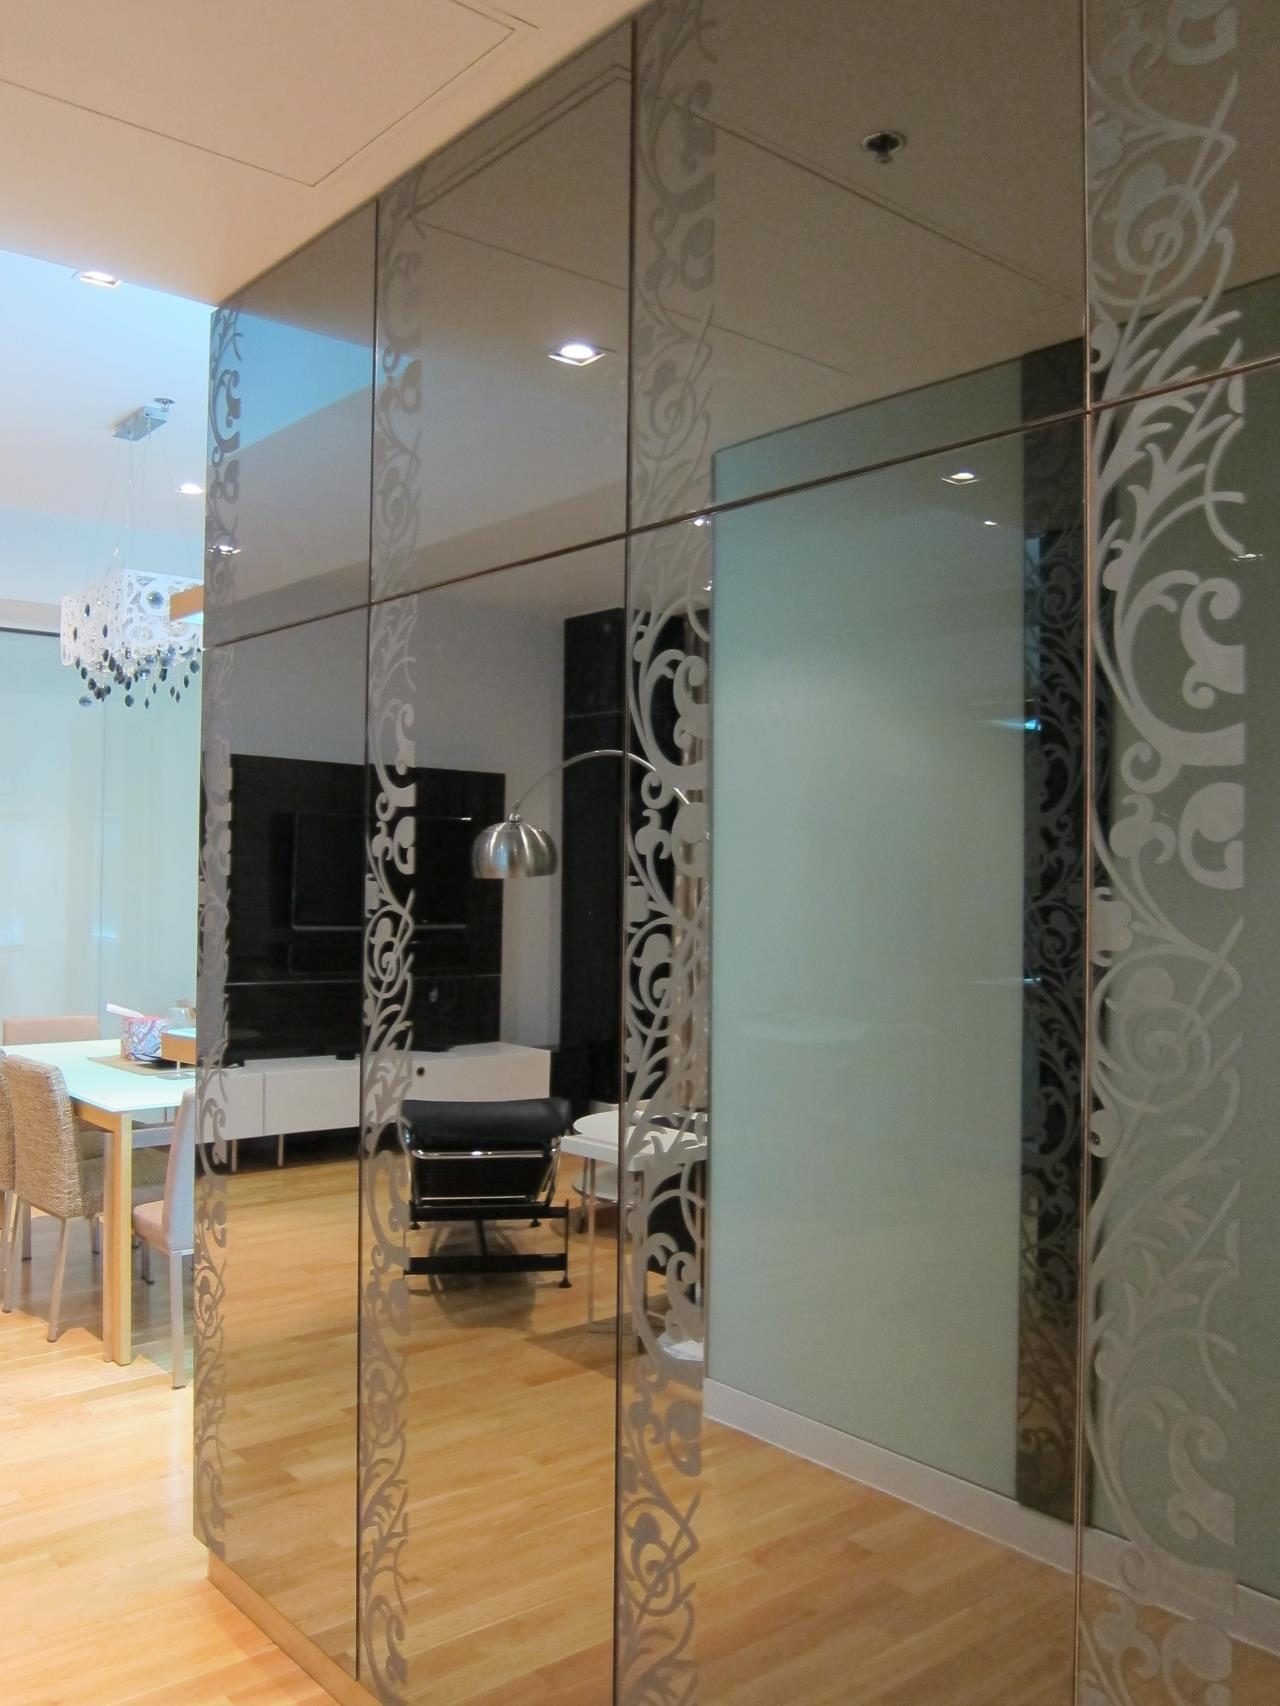 Piri Property Agency's 2 bedrooms Condominium  on tower B floor For Rent 2 6